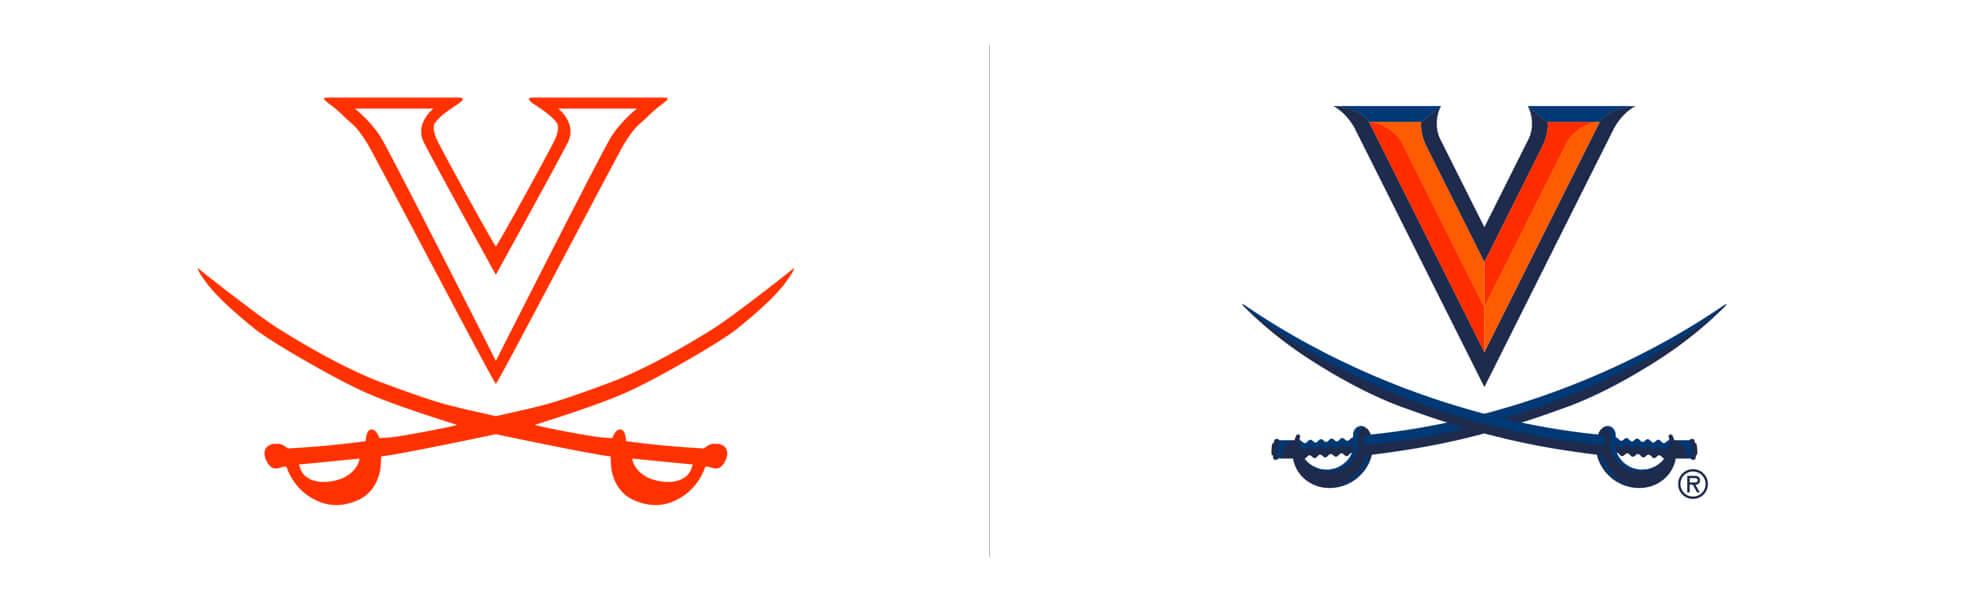 virginia cavaliers znowym logo